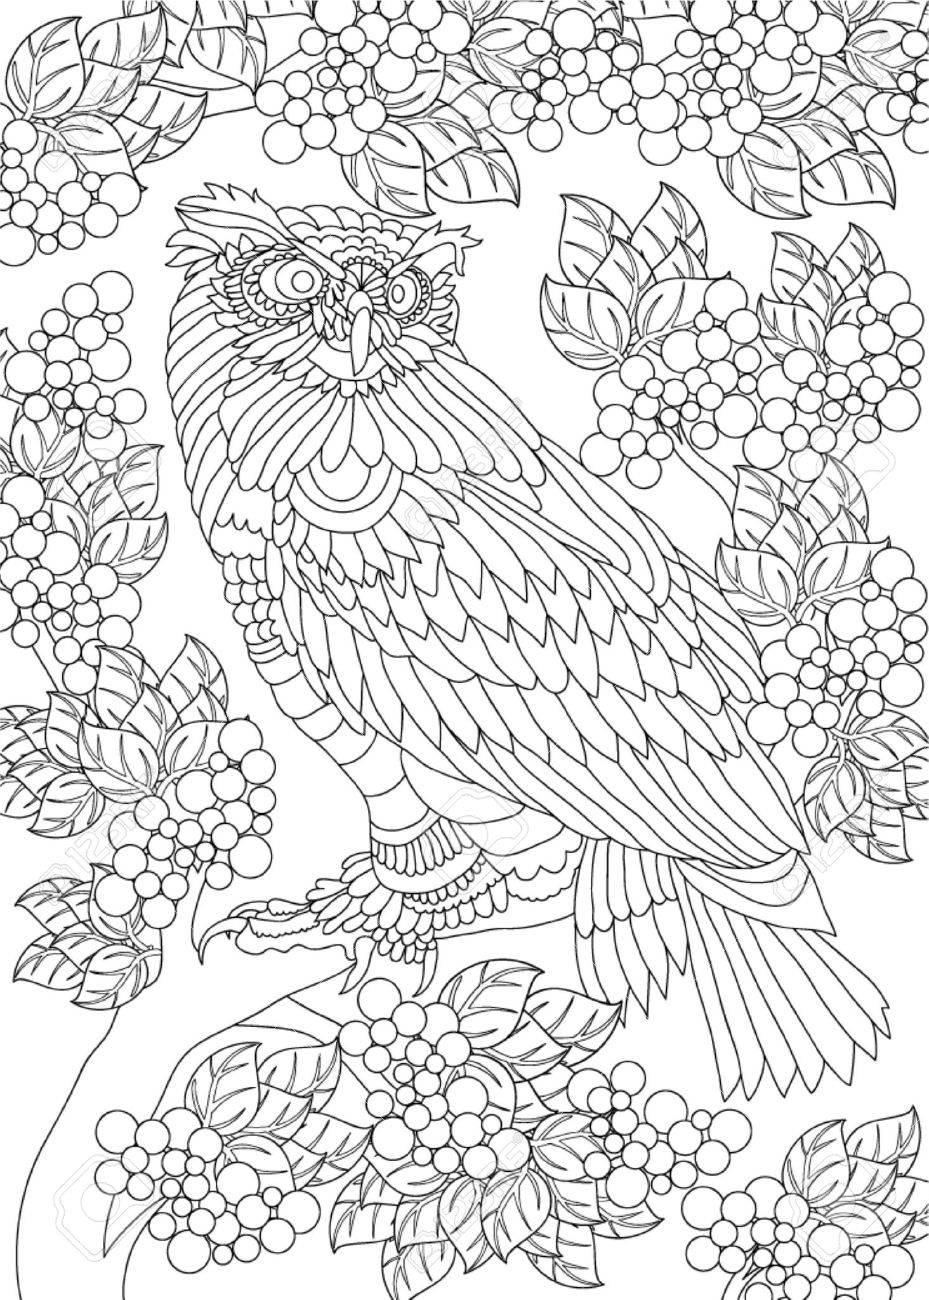 Hand Drawn Bird Coloring Page Royalty Free Cliparts, Vectors, And ...